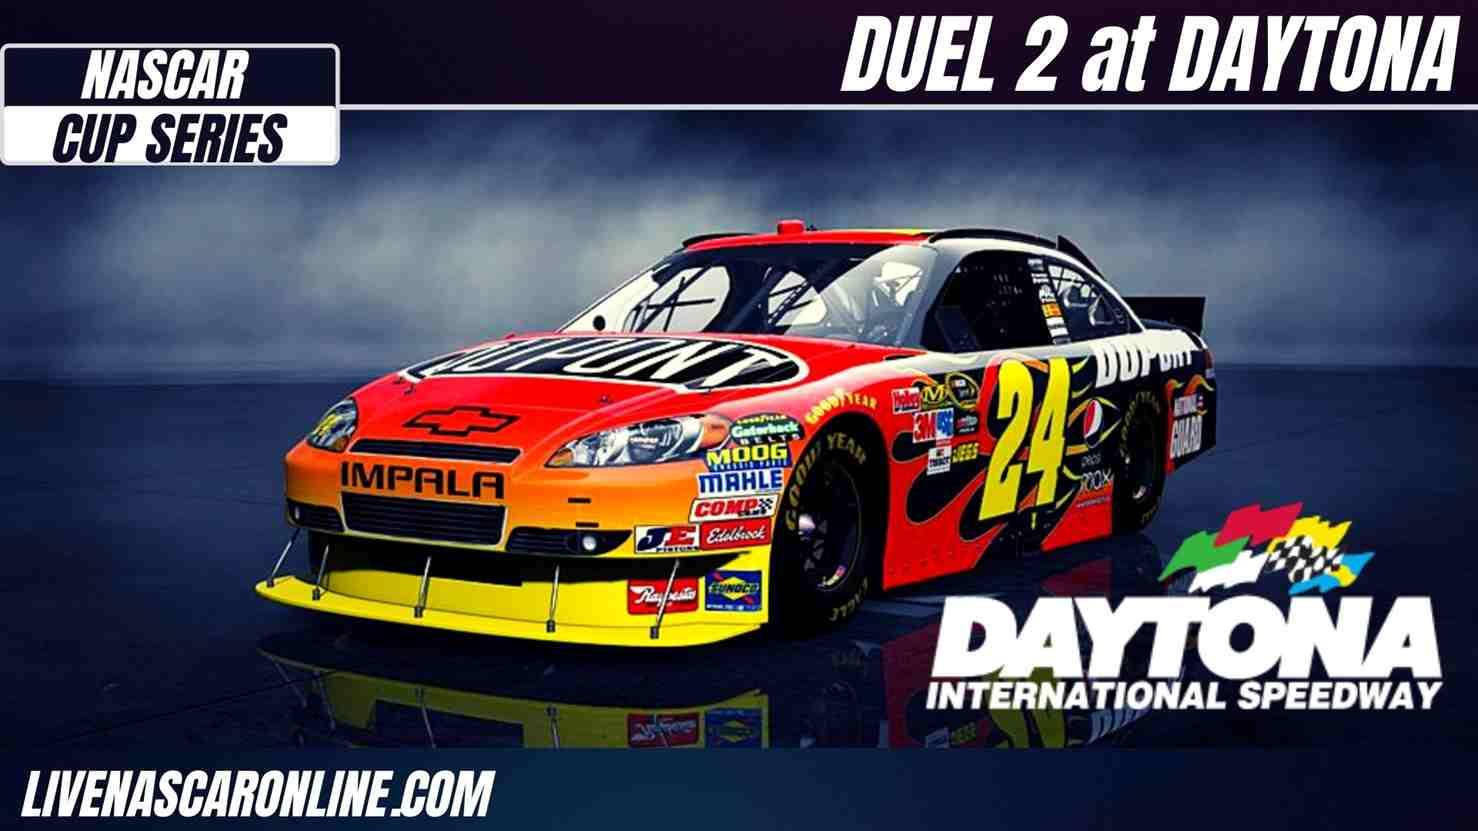 Duel 2 at DAYTONA Live Stream 2021